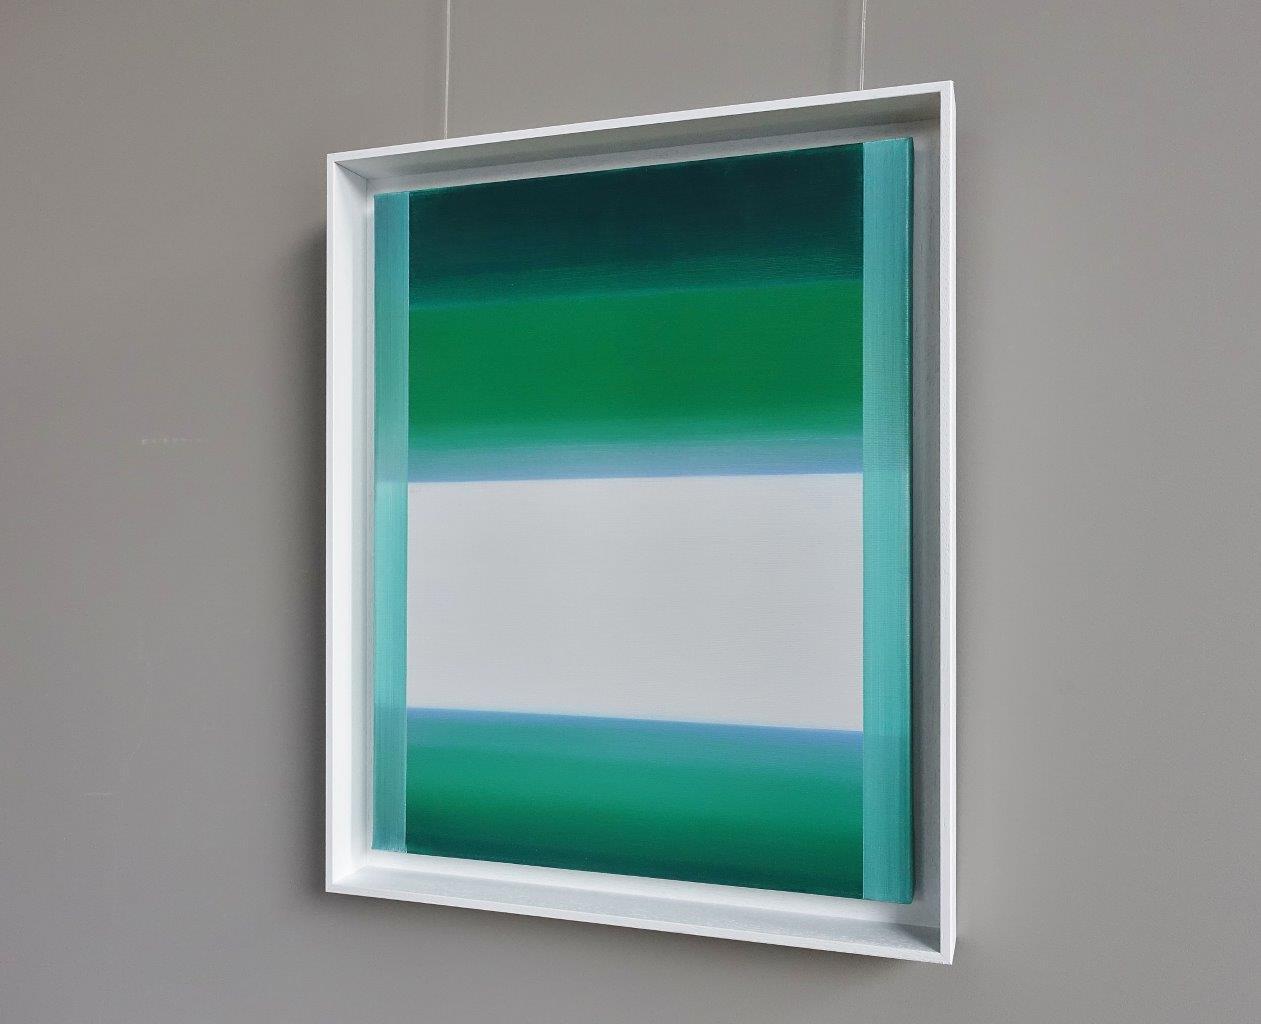 Anna Podlewska : White on grassy greens